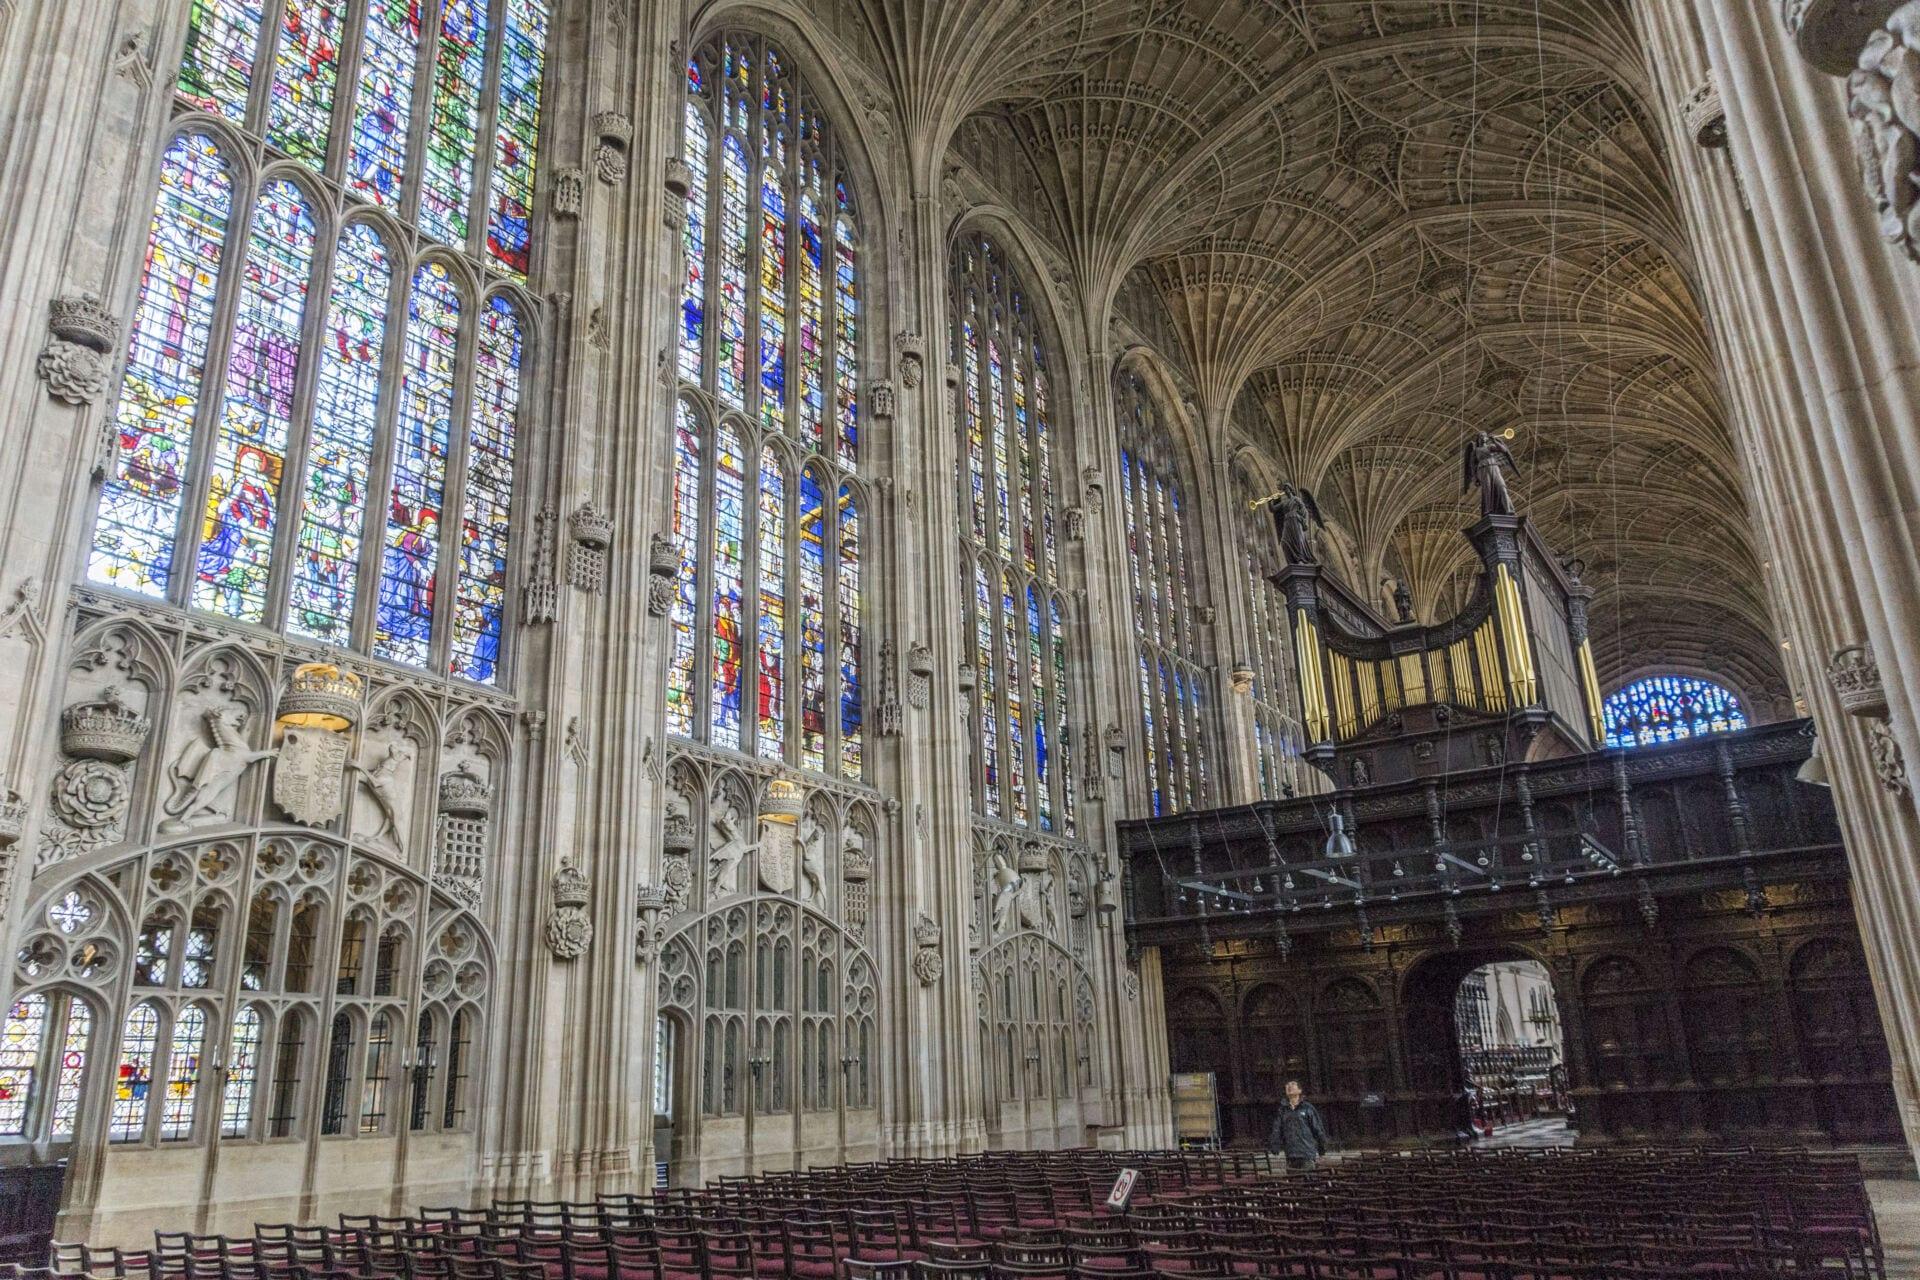 Cambridges King's College Chapel Interior